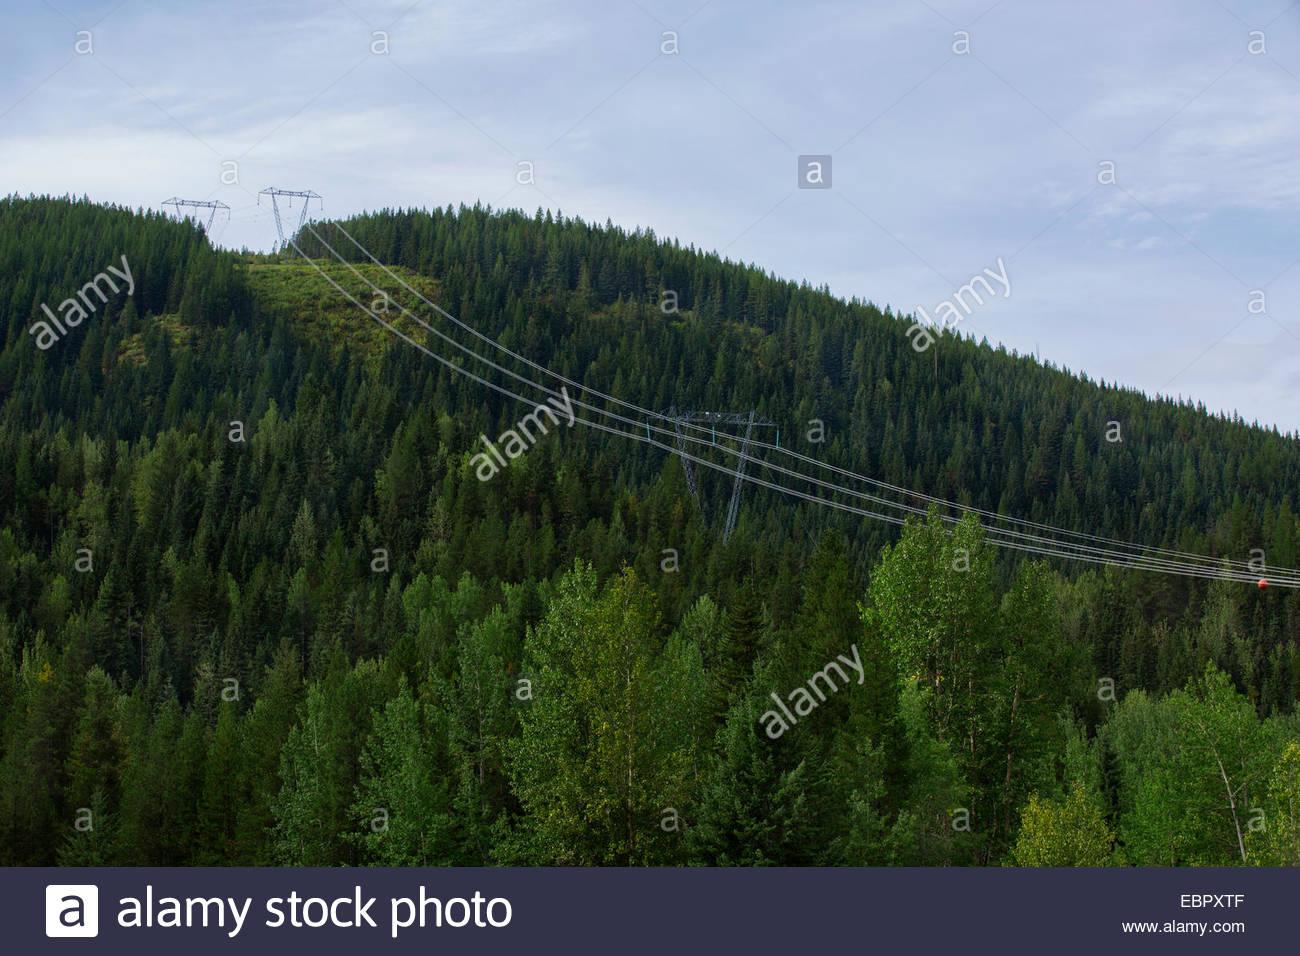 Power lines spanning forest hillside - Stock Image